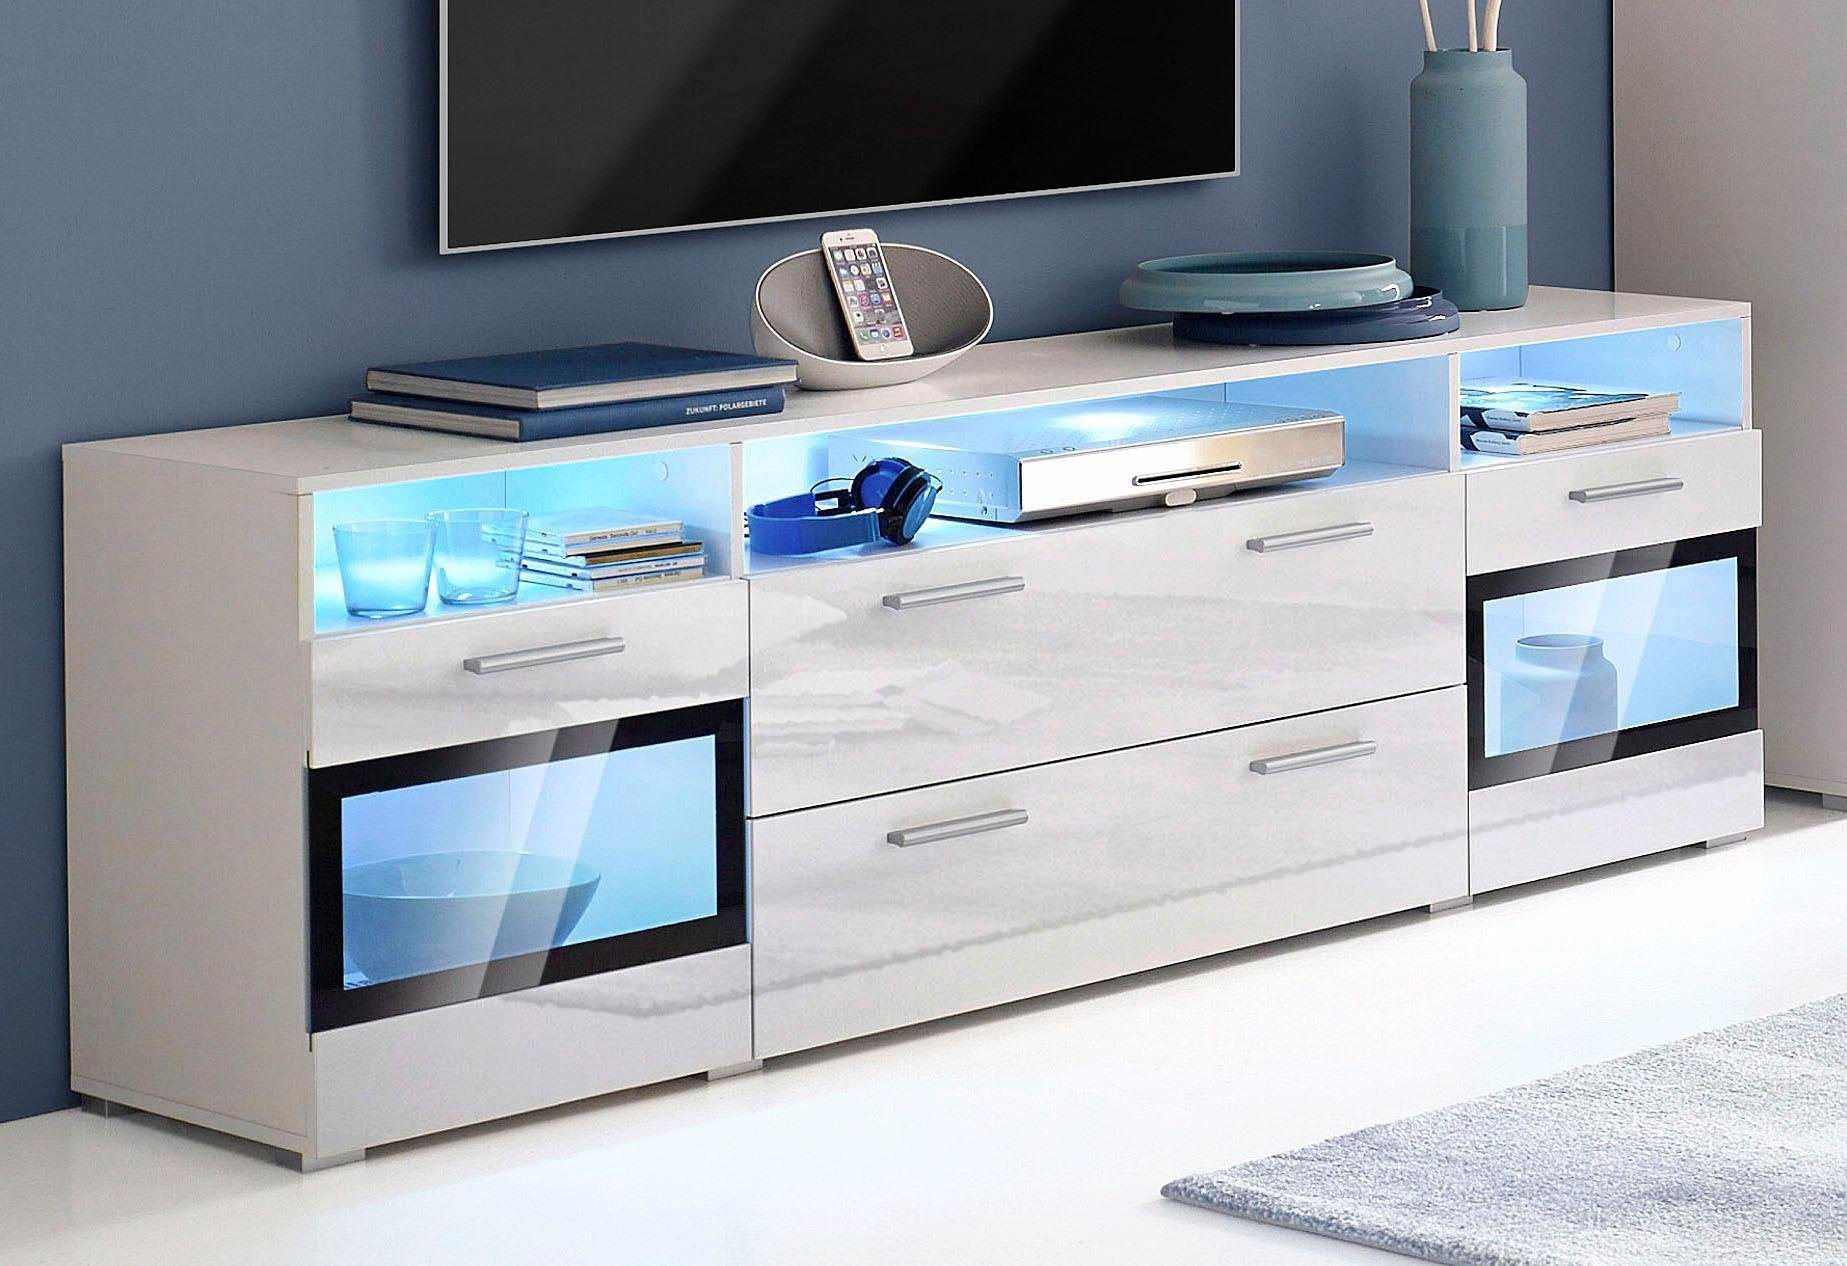 weiss melamin lowboards online kaufen m bel suchmaschine. Black Bedroom Furniture Sets. Home Design Ideas